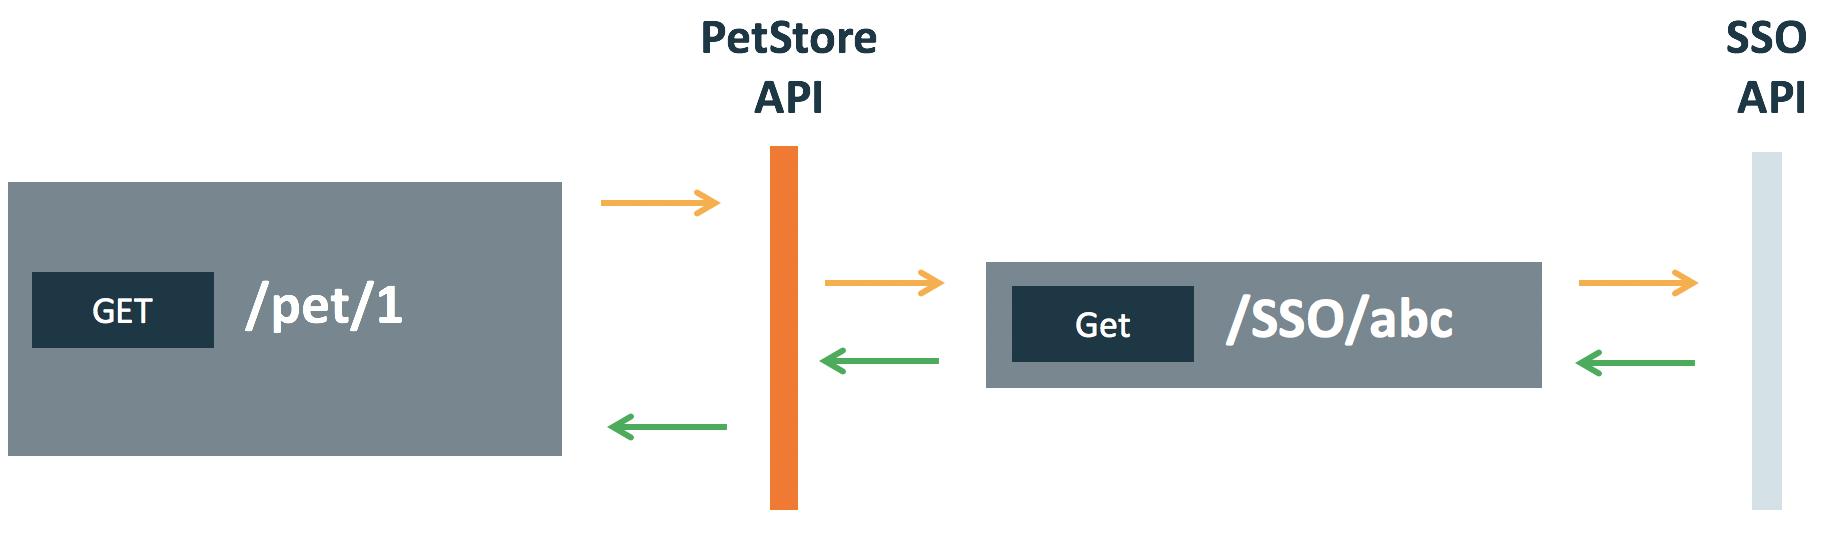 Integration API testing